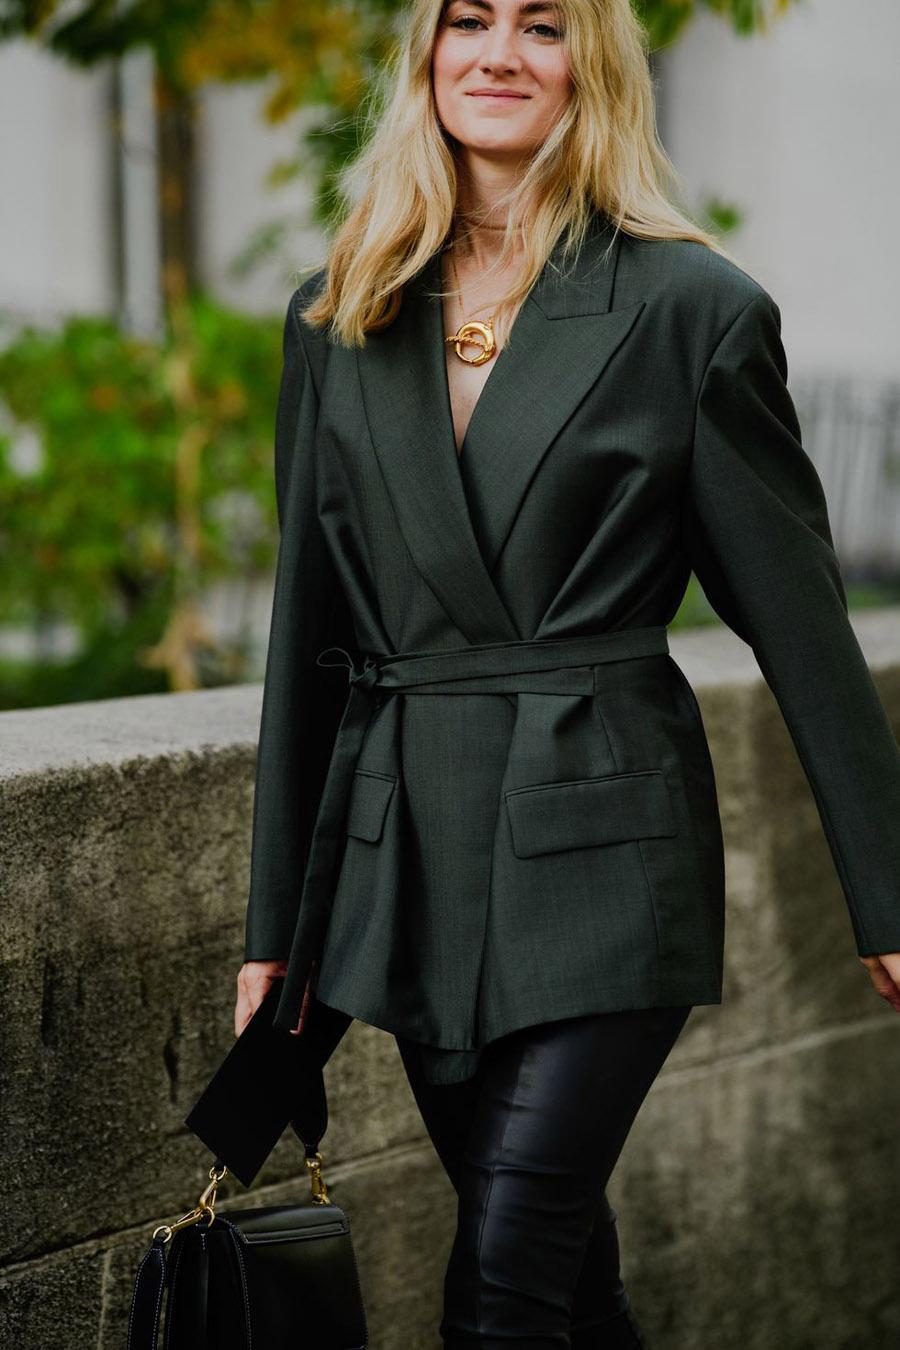 paris-fashion-week-pfw-street-style-ss20-day-5-by-tyler-joe-023-1569835064